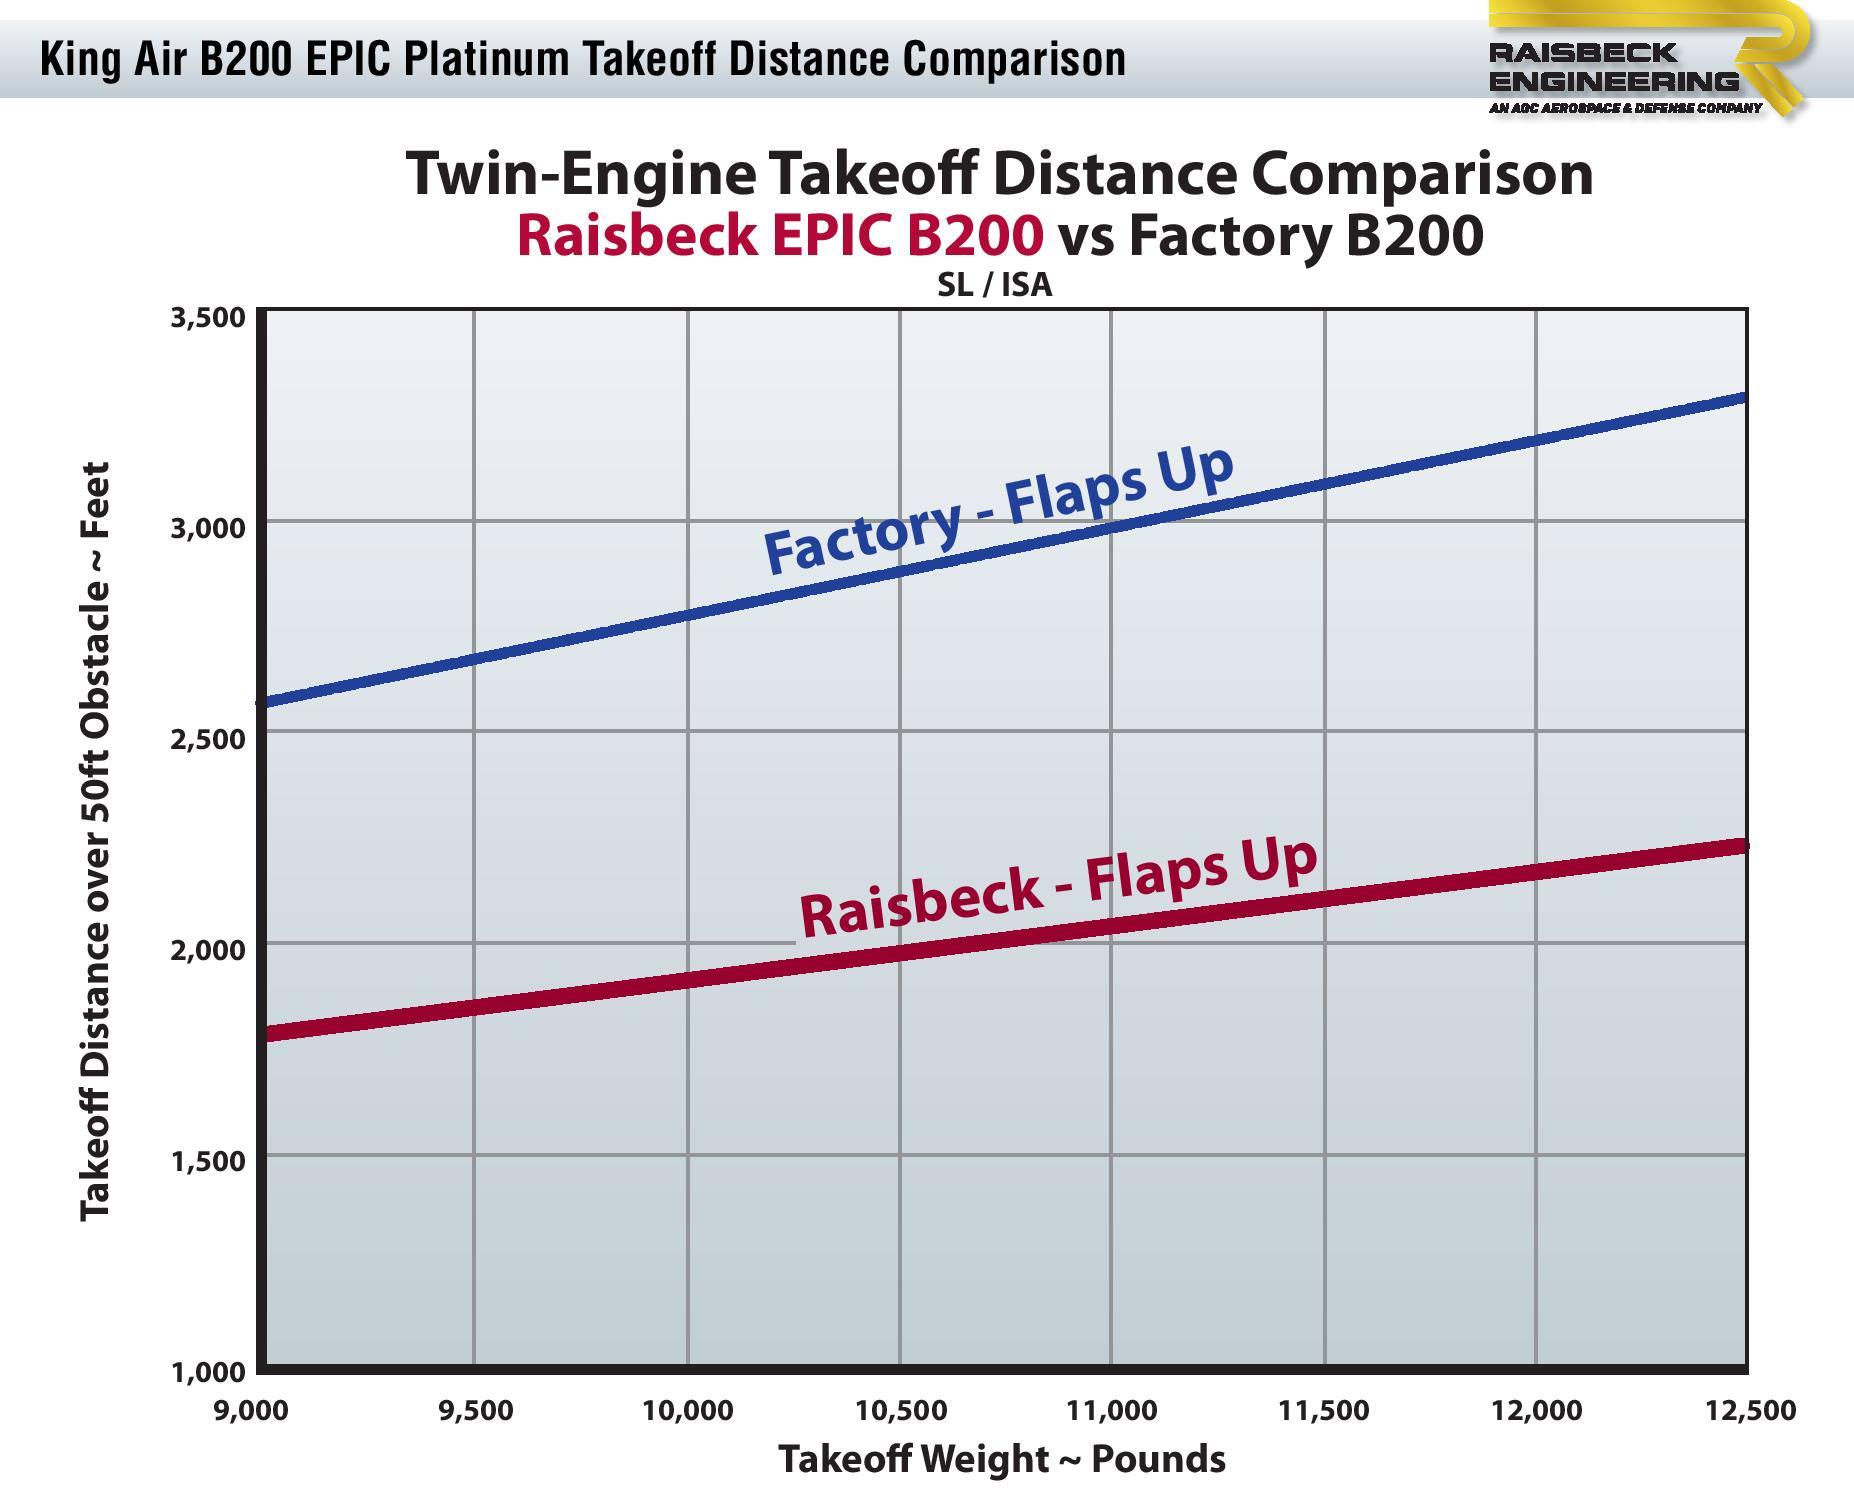 B200 EPIC Platinum Takeoff Distance Chart